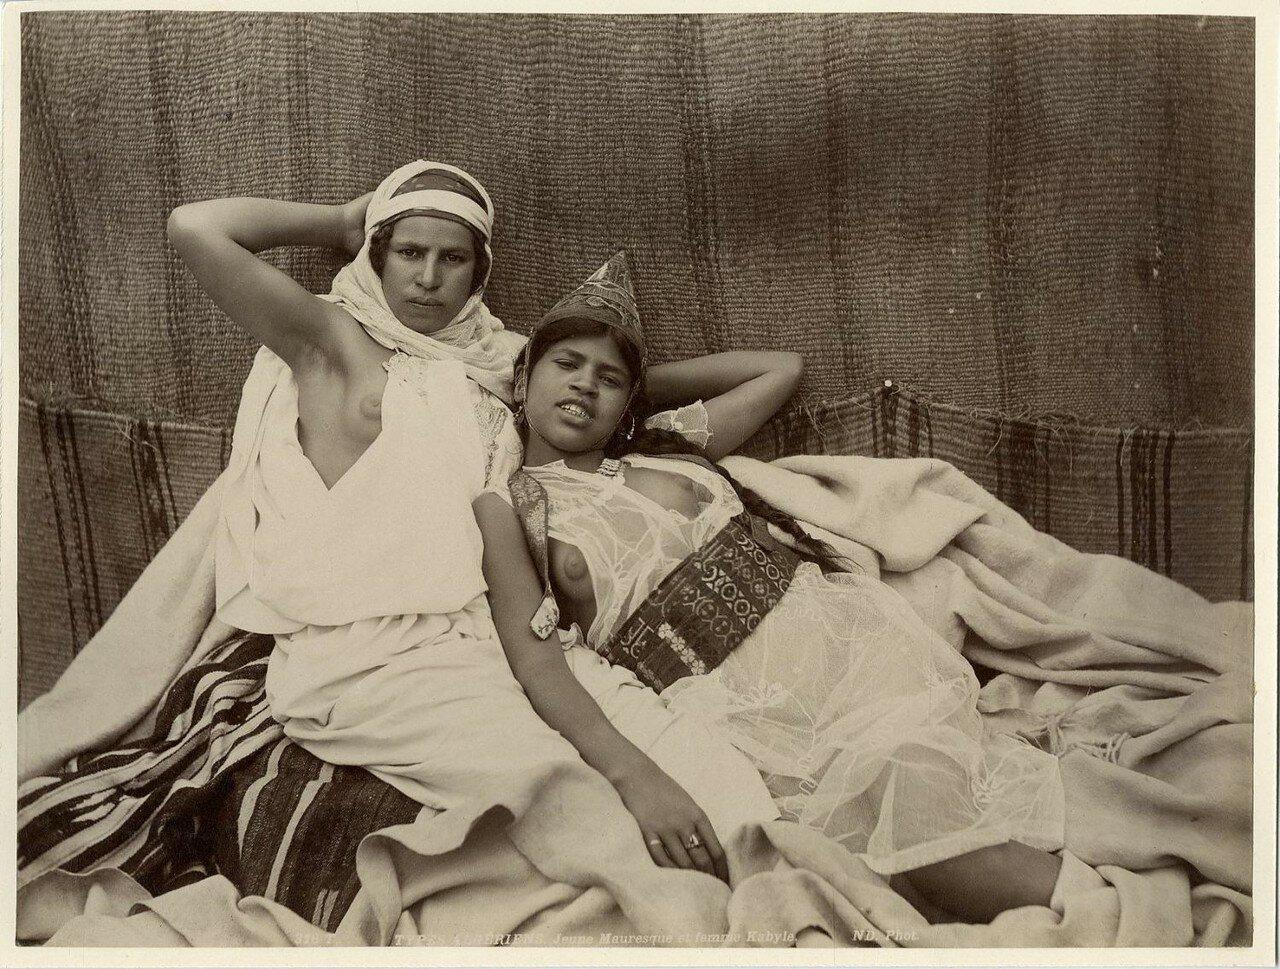 Мавританка и кабилка